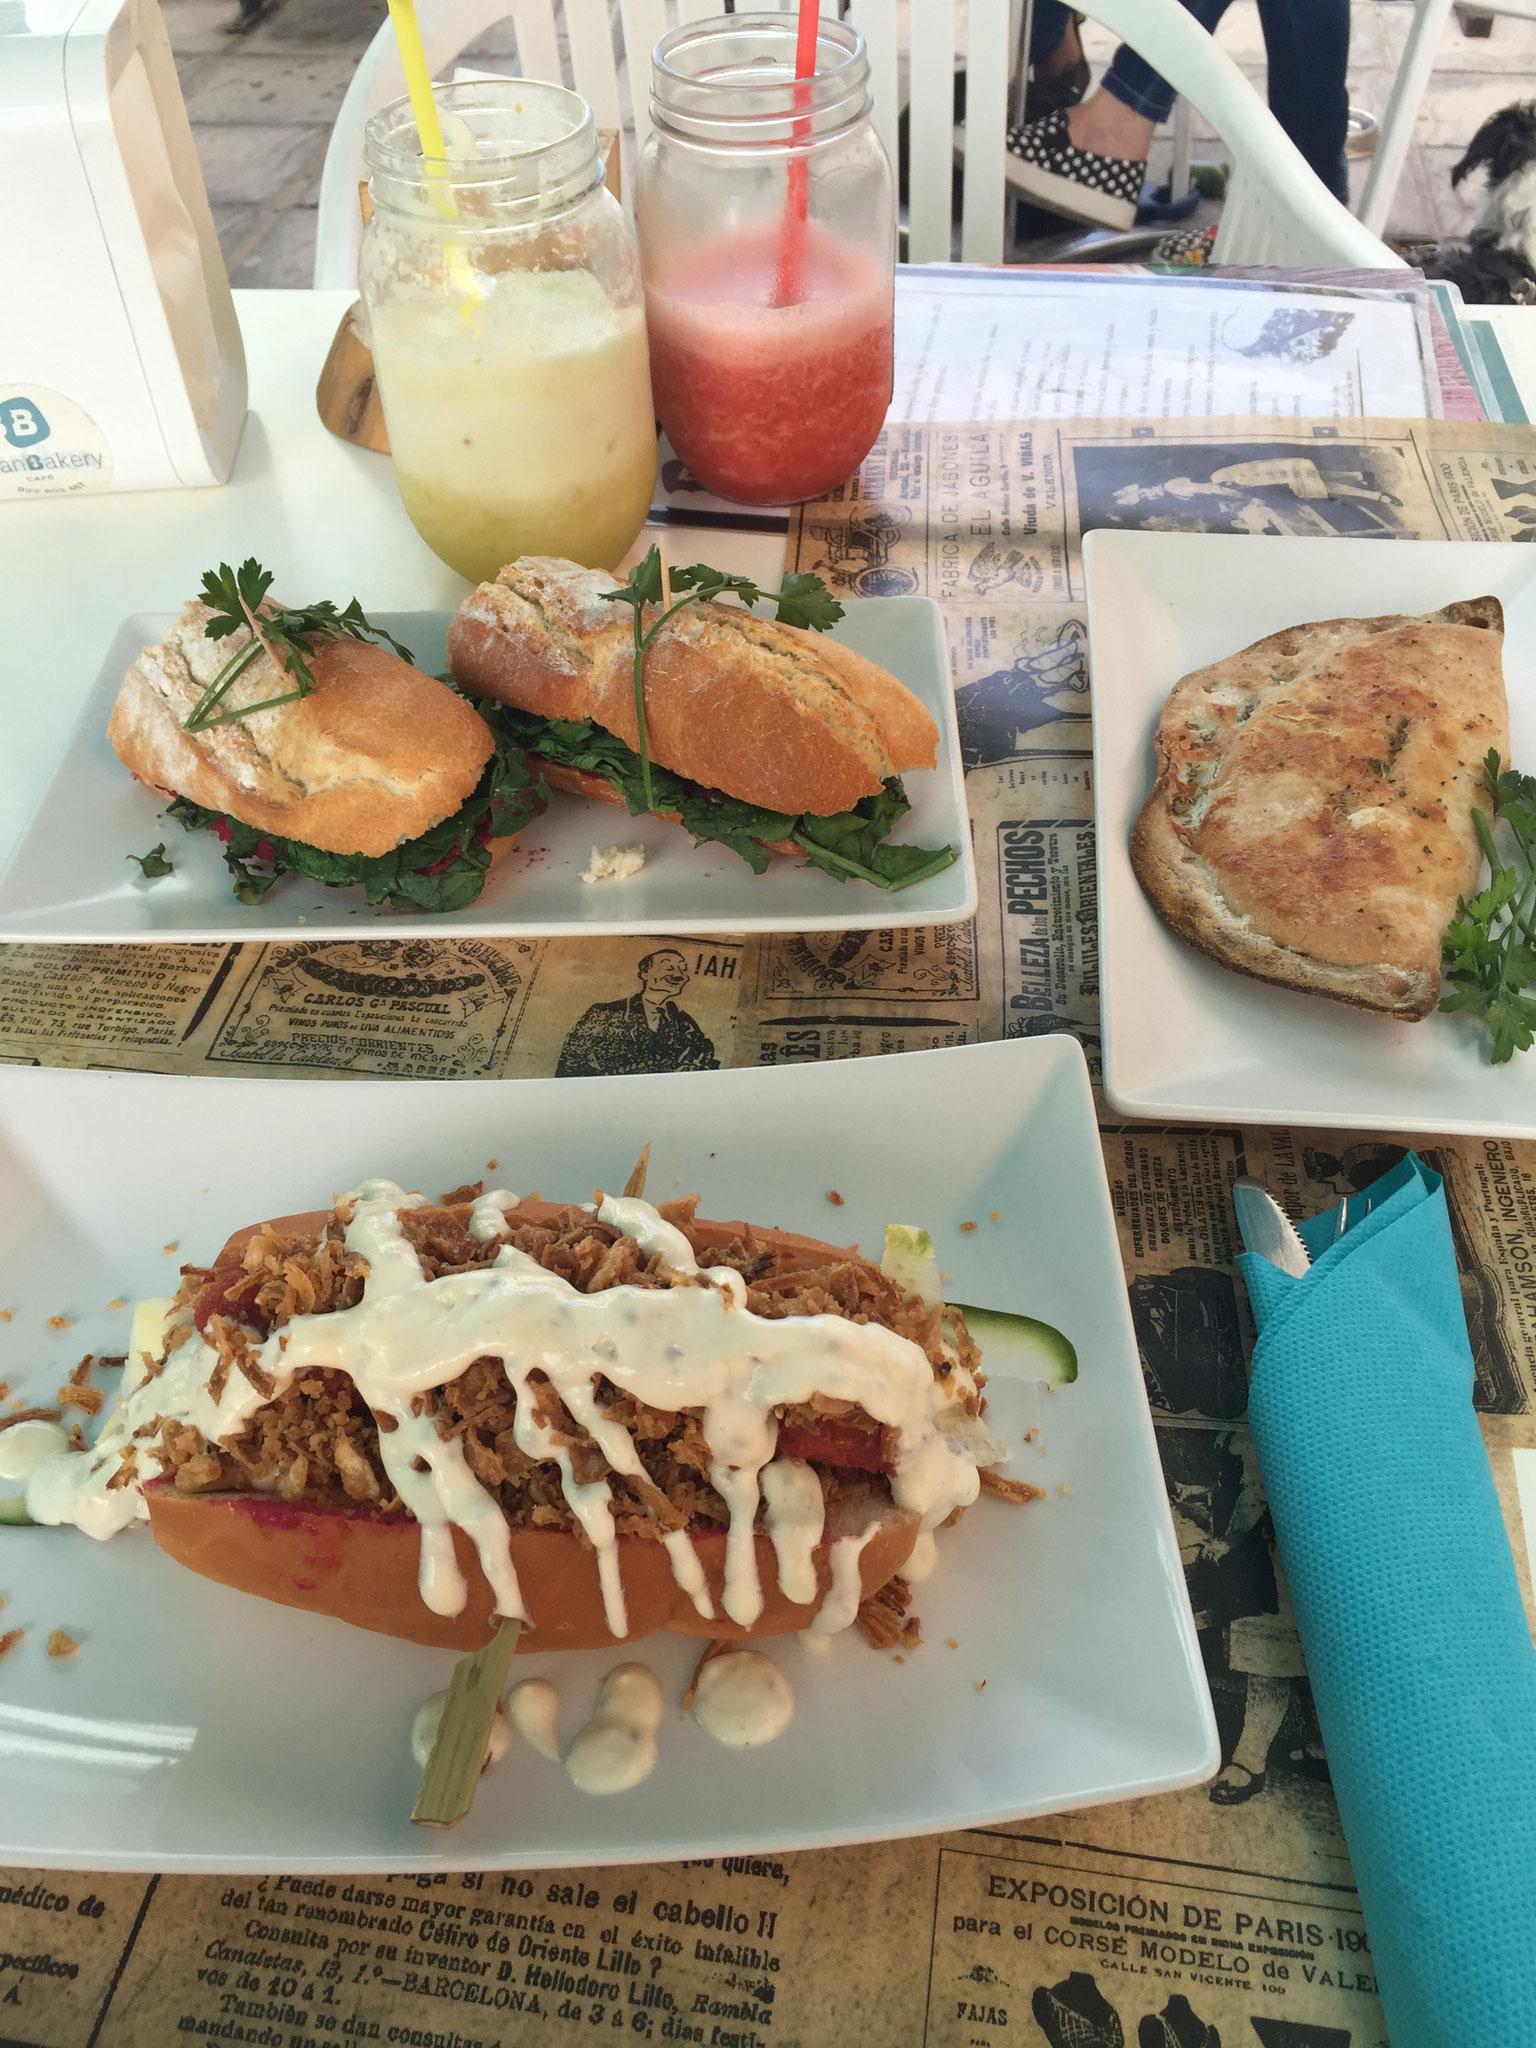 PlanBakery Cafe, hummus sandwich, veggie empanada, vegan hotdog. Candelaria